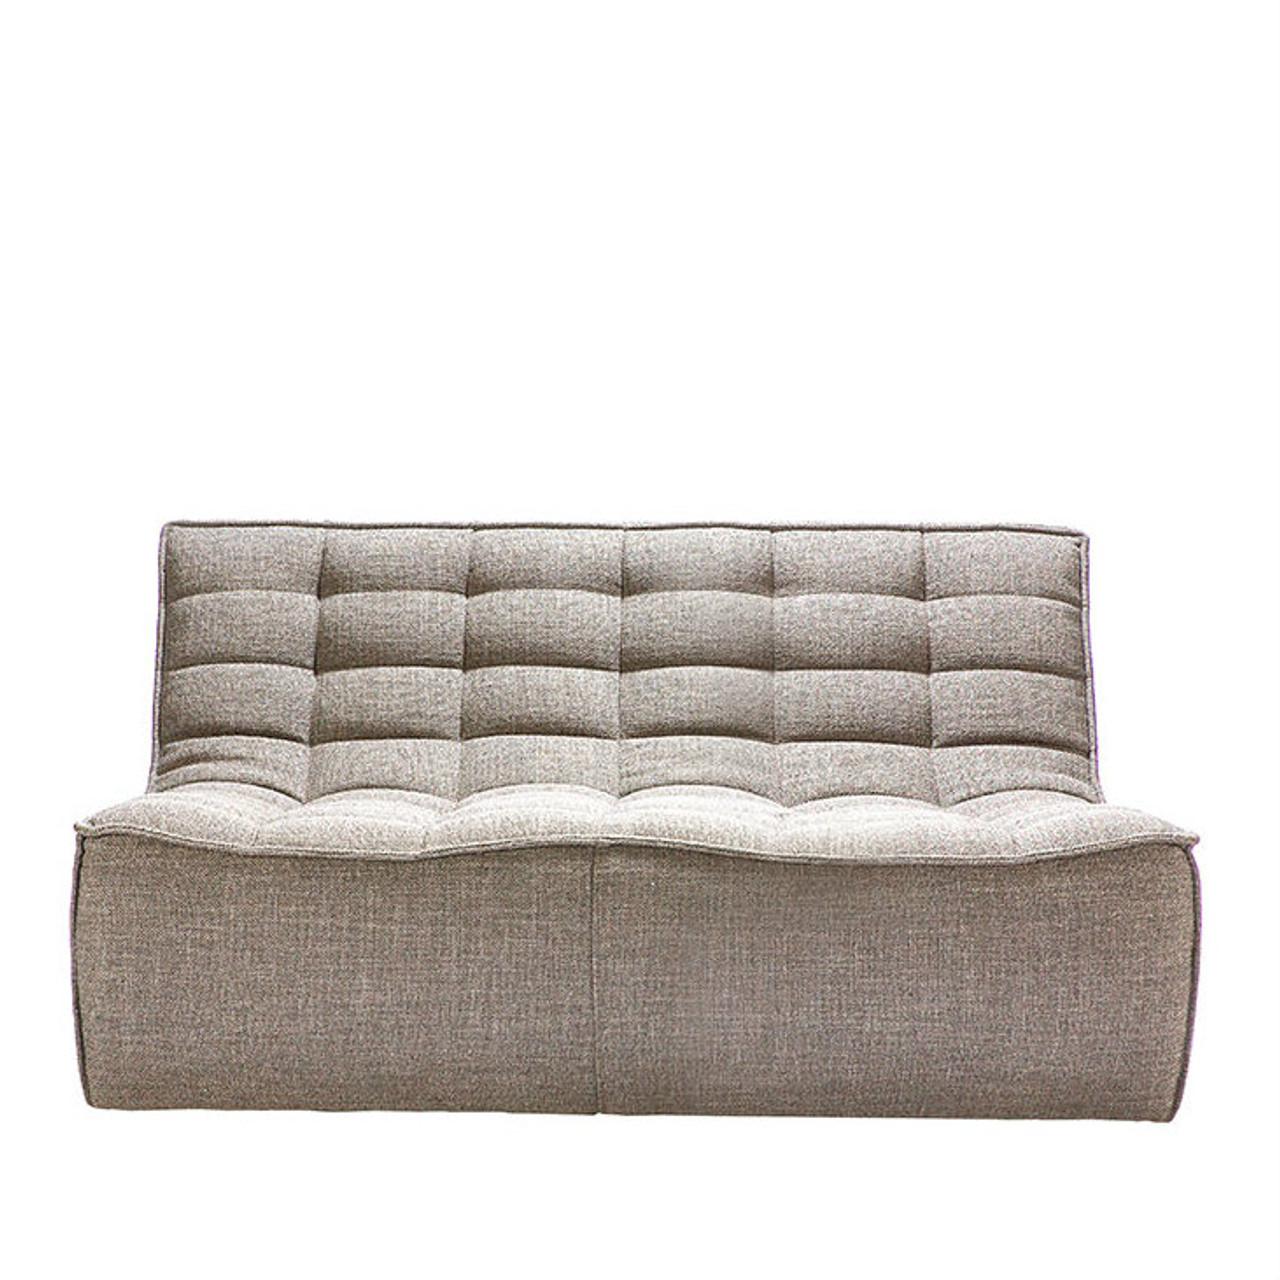 Roset Modern Modular Sectional Sofa - 2 Seater